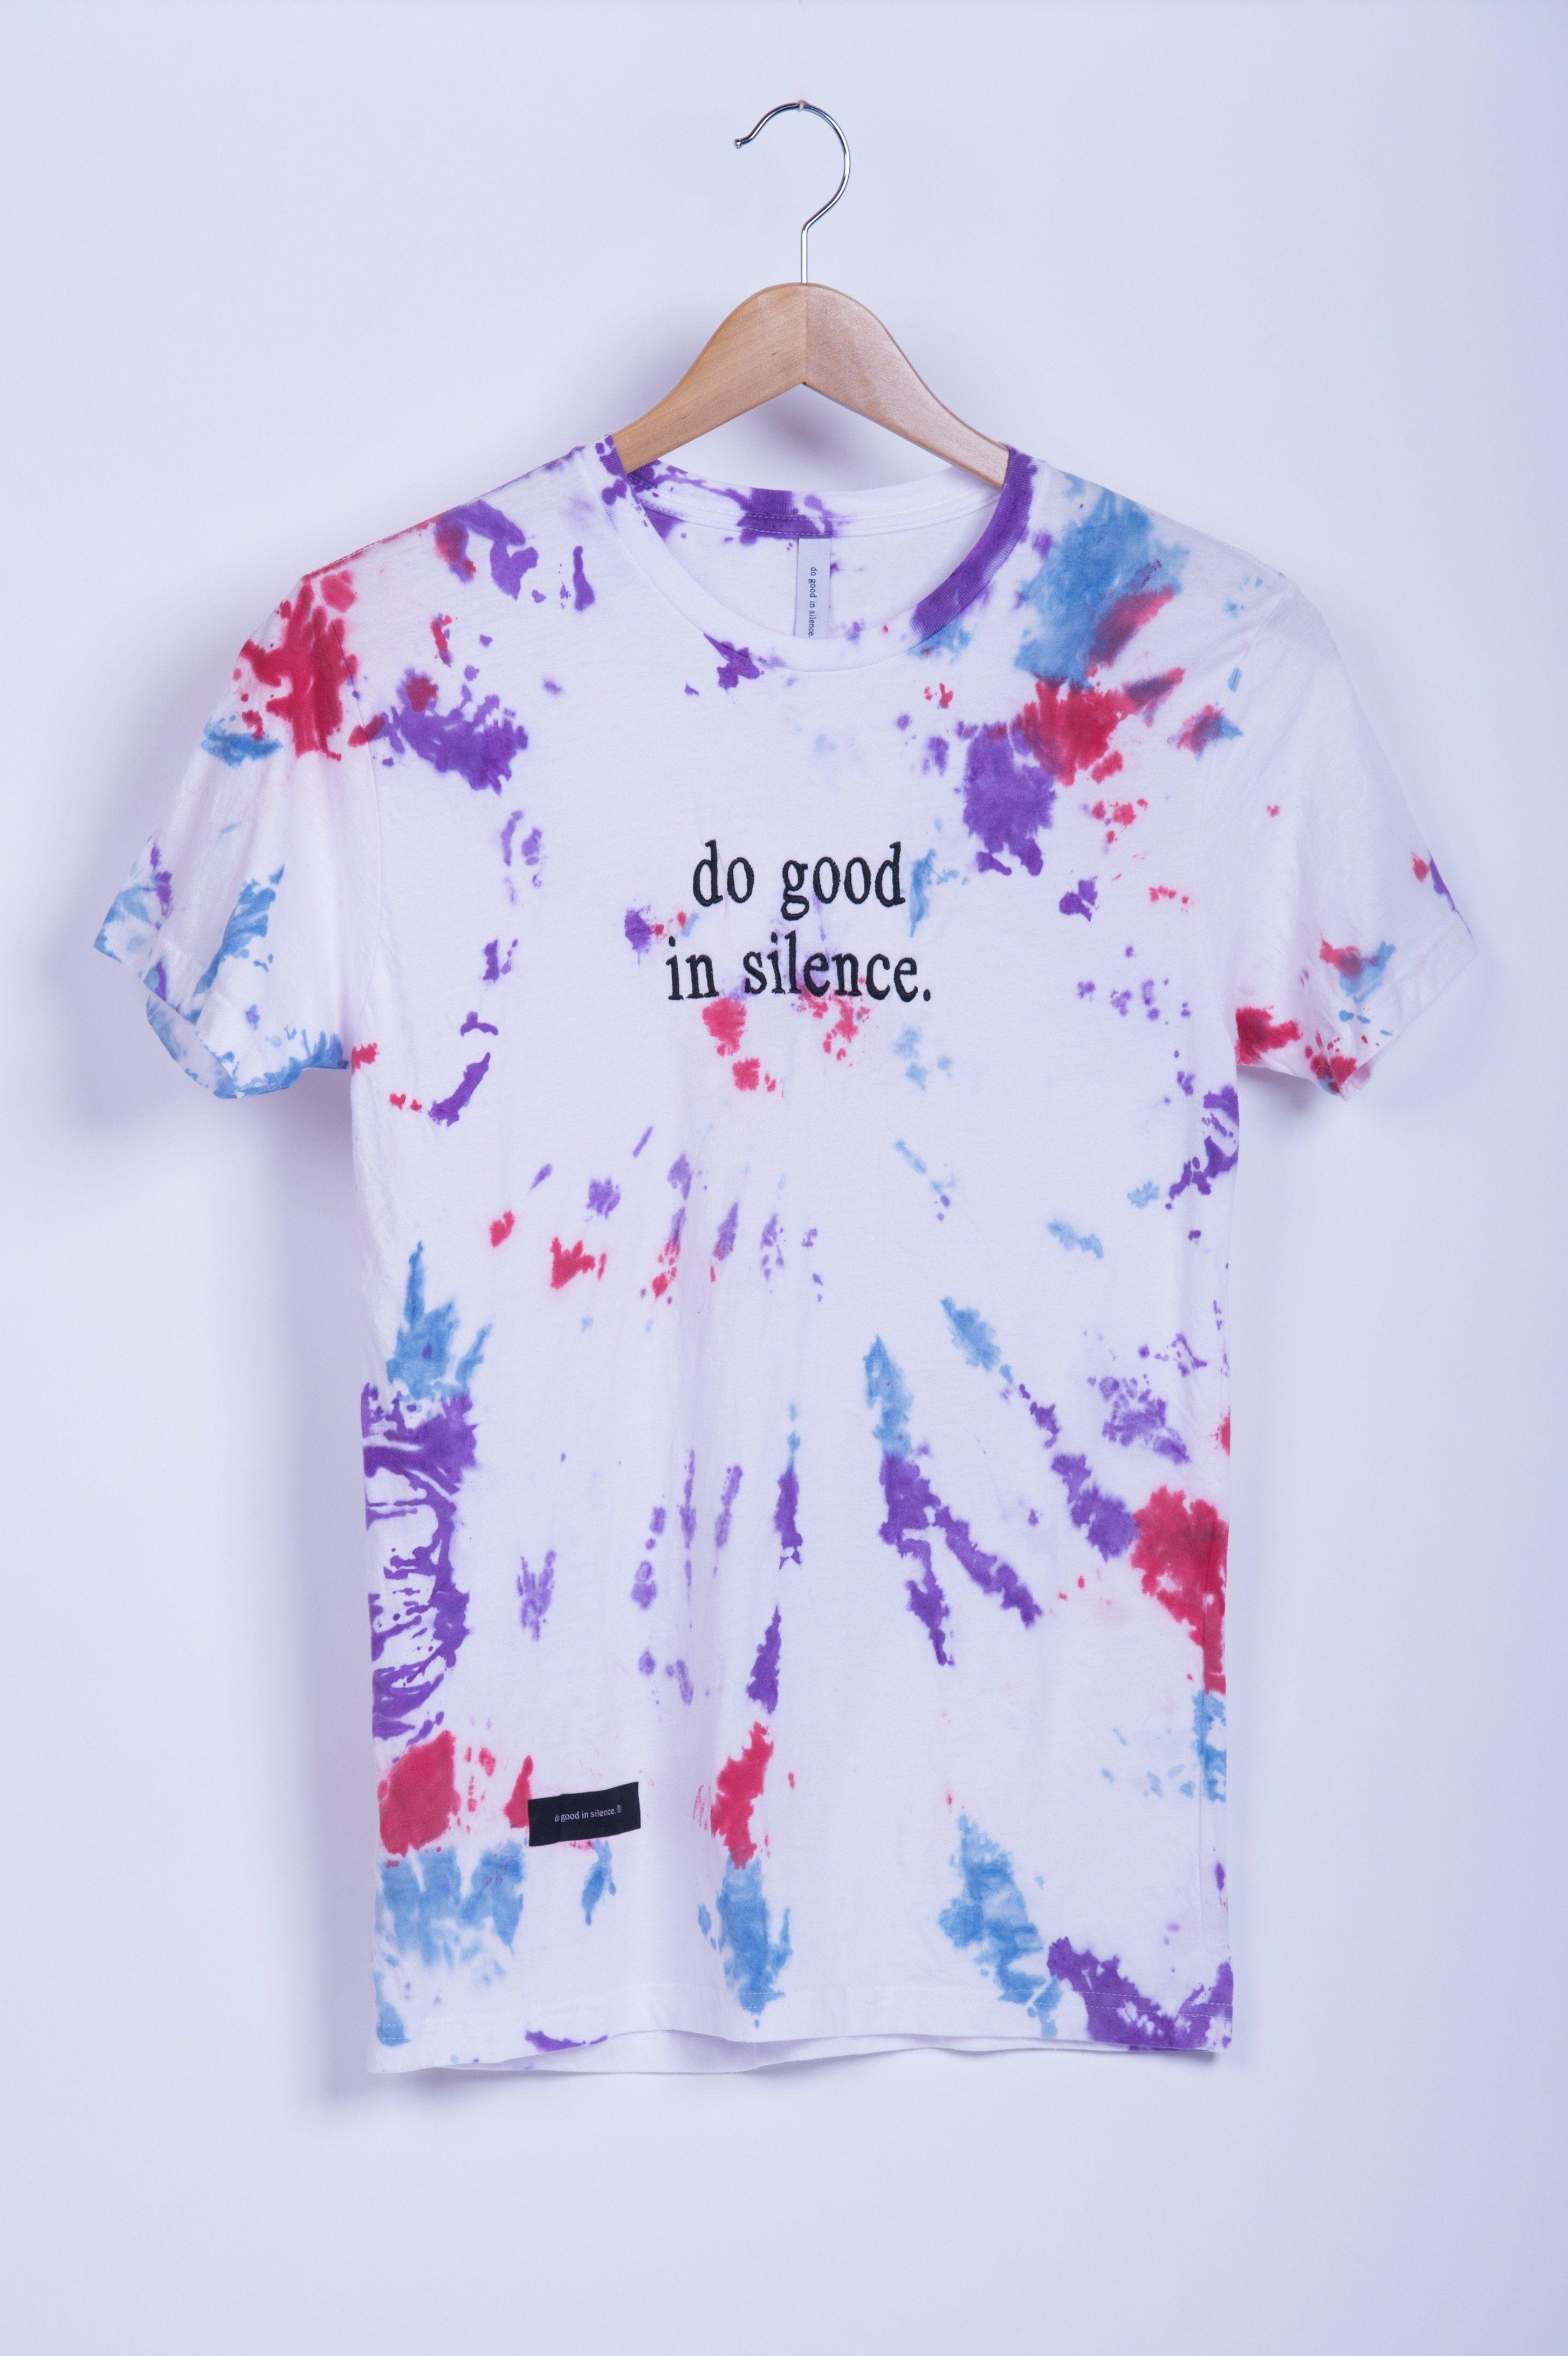 Do Good In Silence Tie Dye Shirt Tie Dye Tie Dye Shirt Tie Dye Designs [ 4369 x 2908 Pixel ]